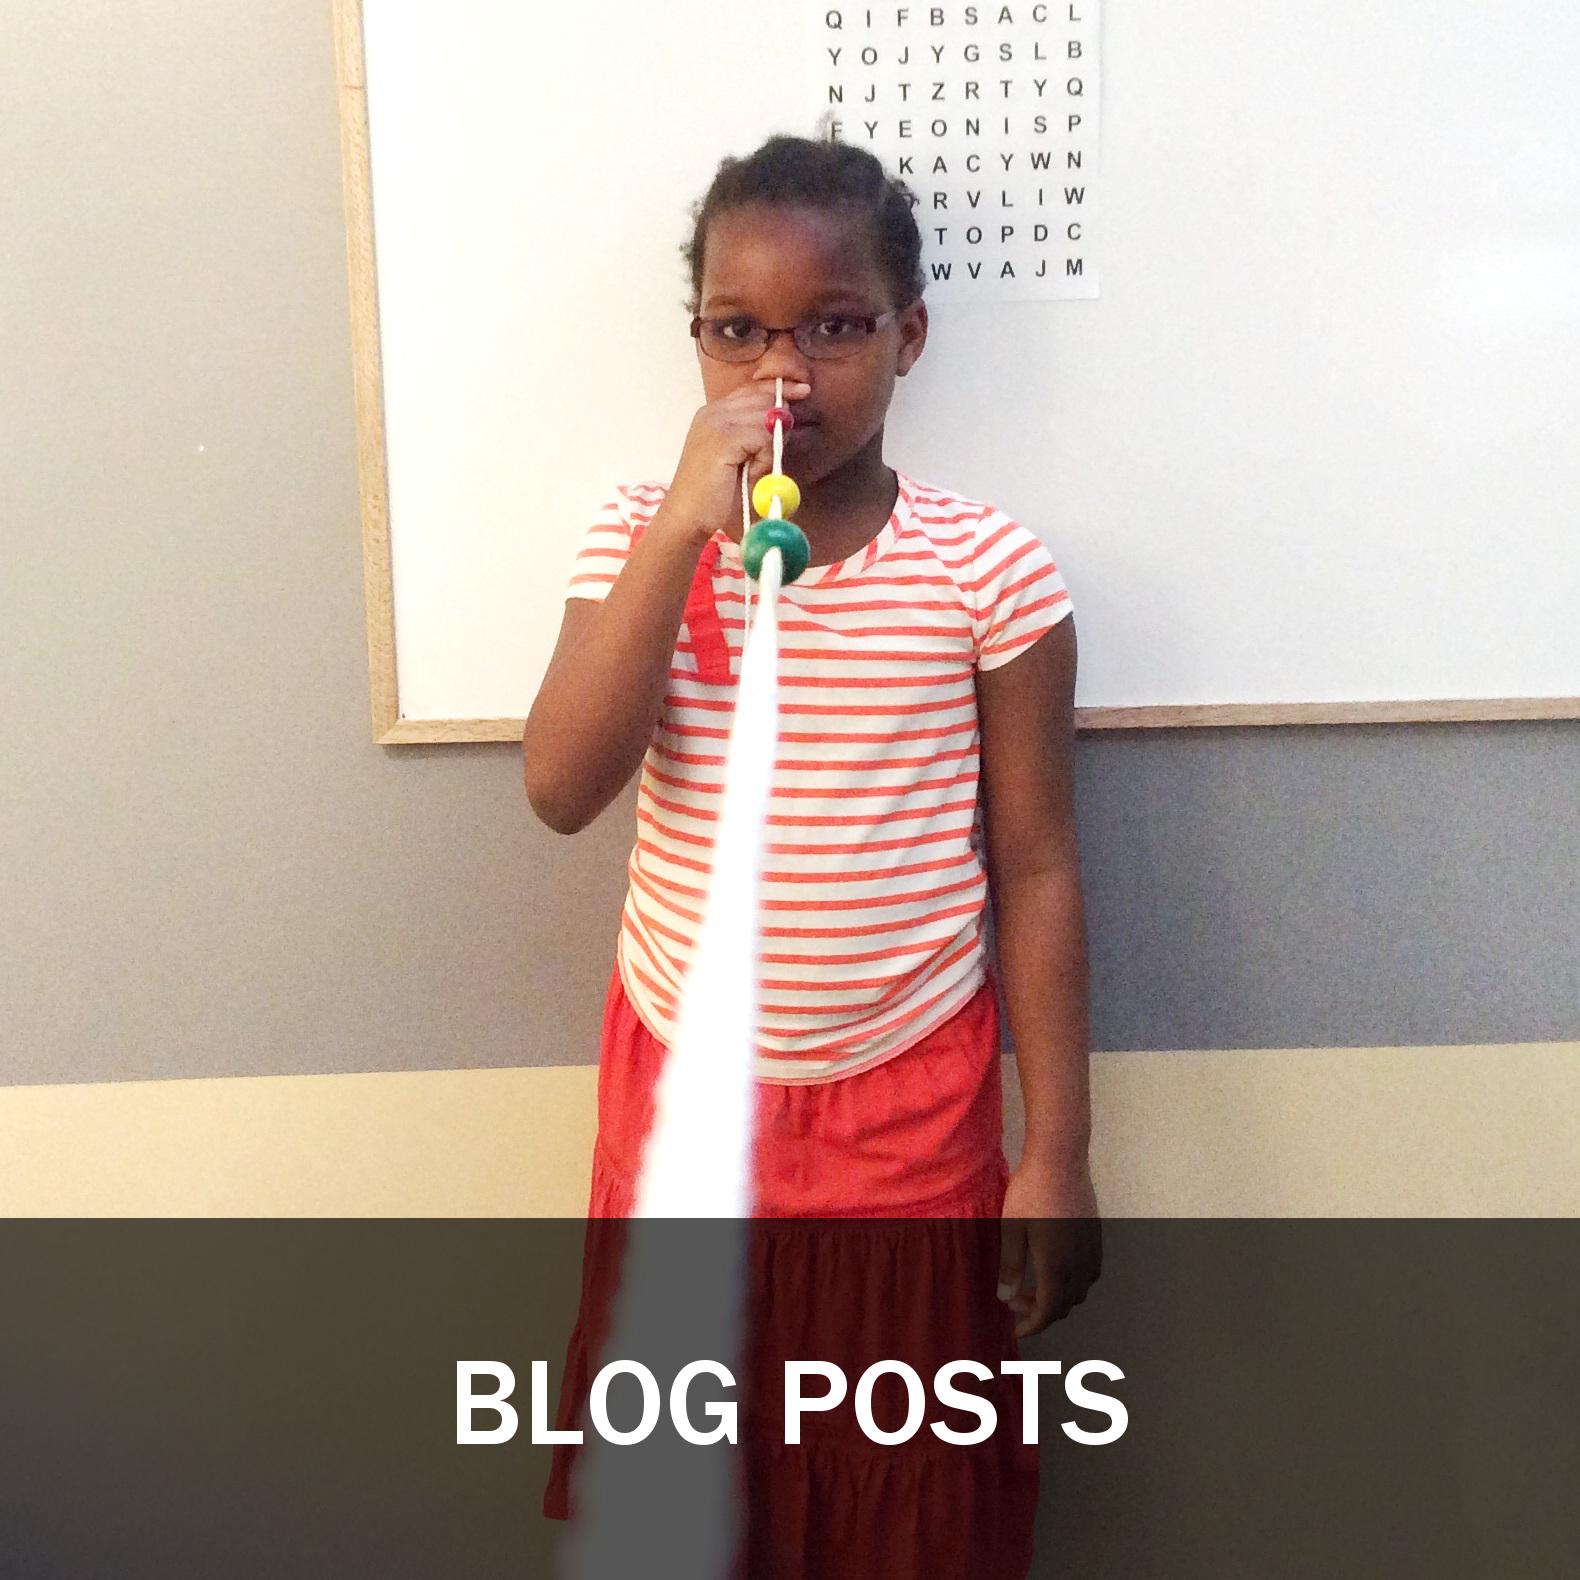 blog posts2.png